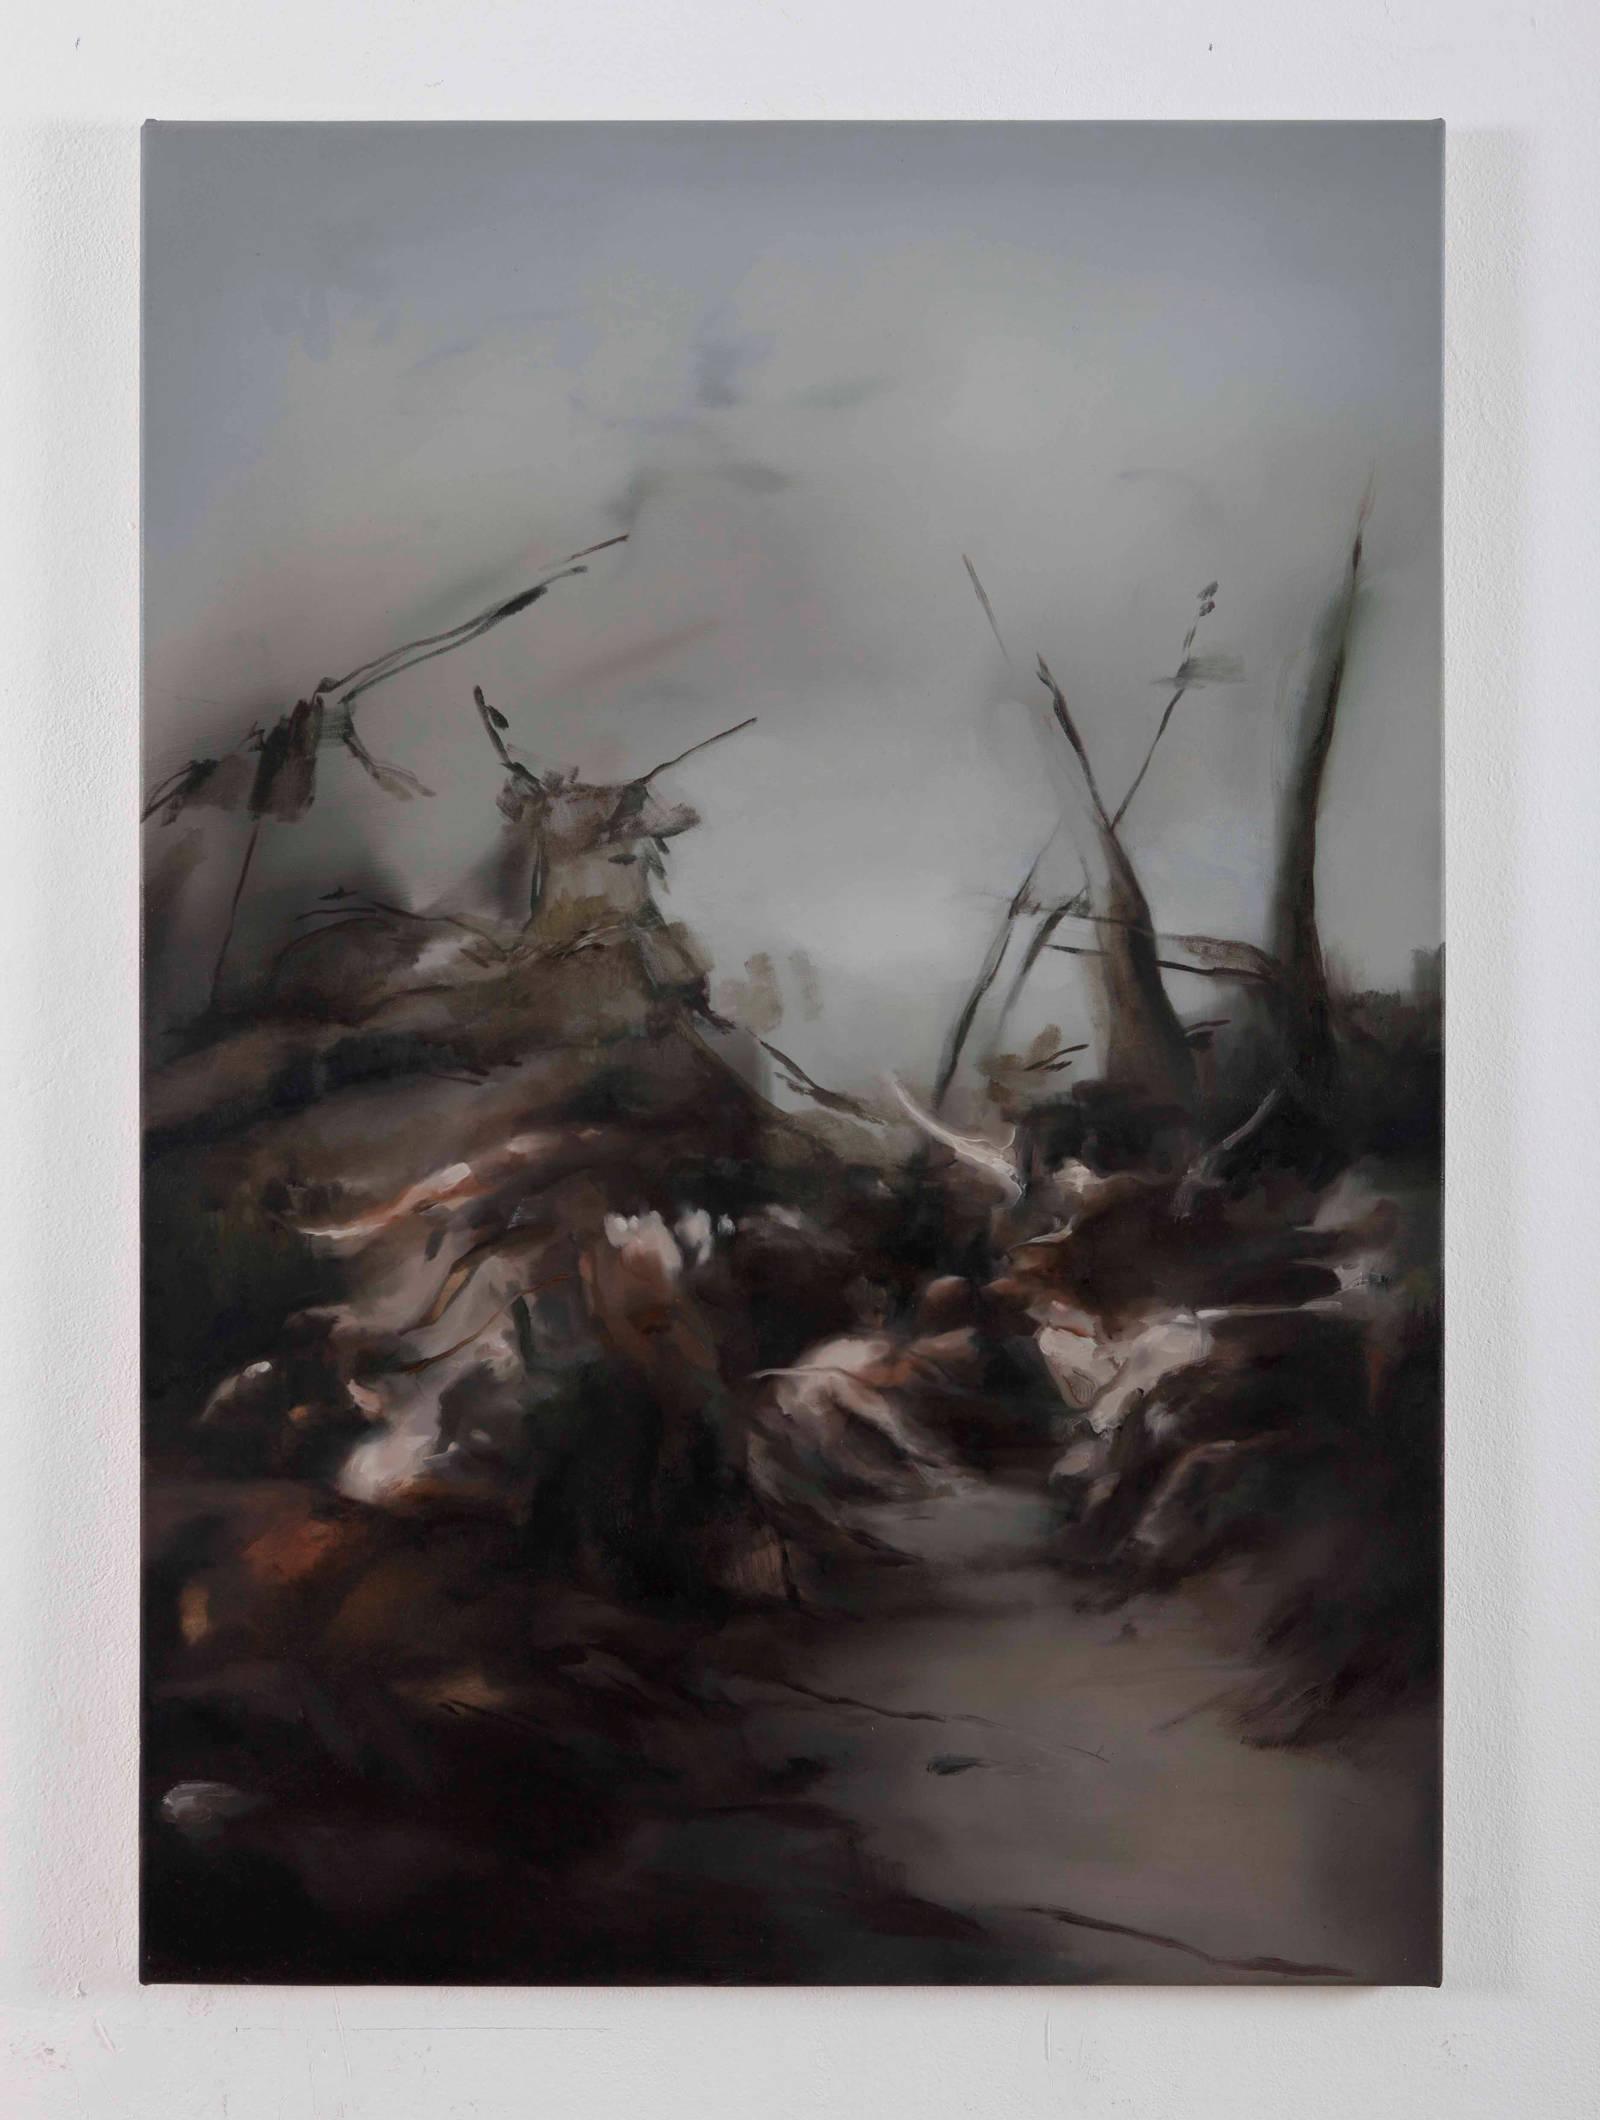 11. NPM, battaglia, 2015, olio su tela, 100x70cm